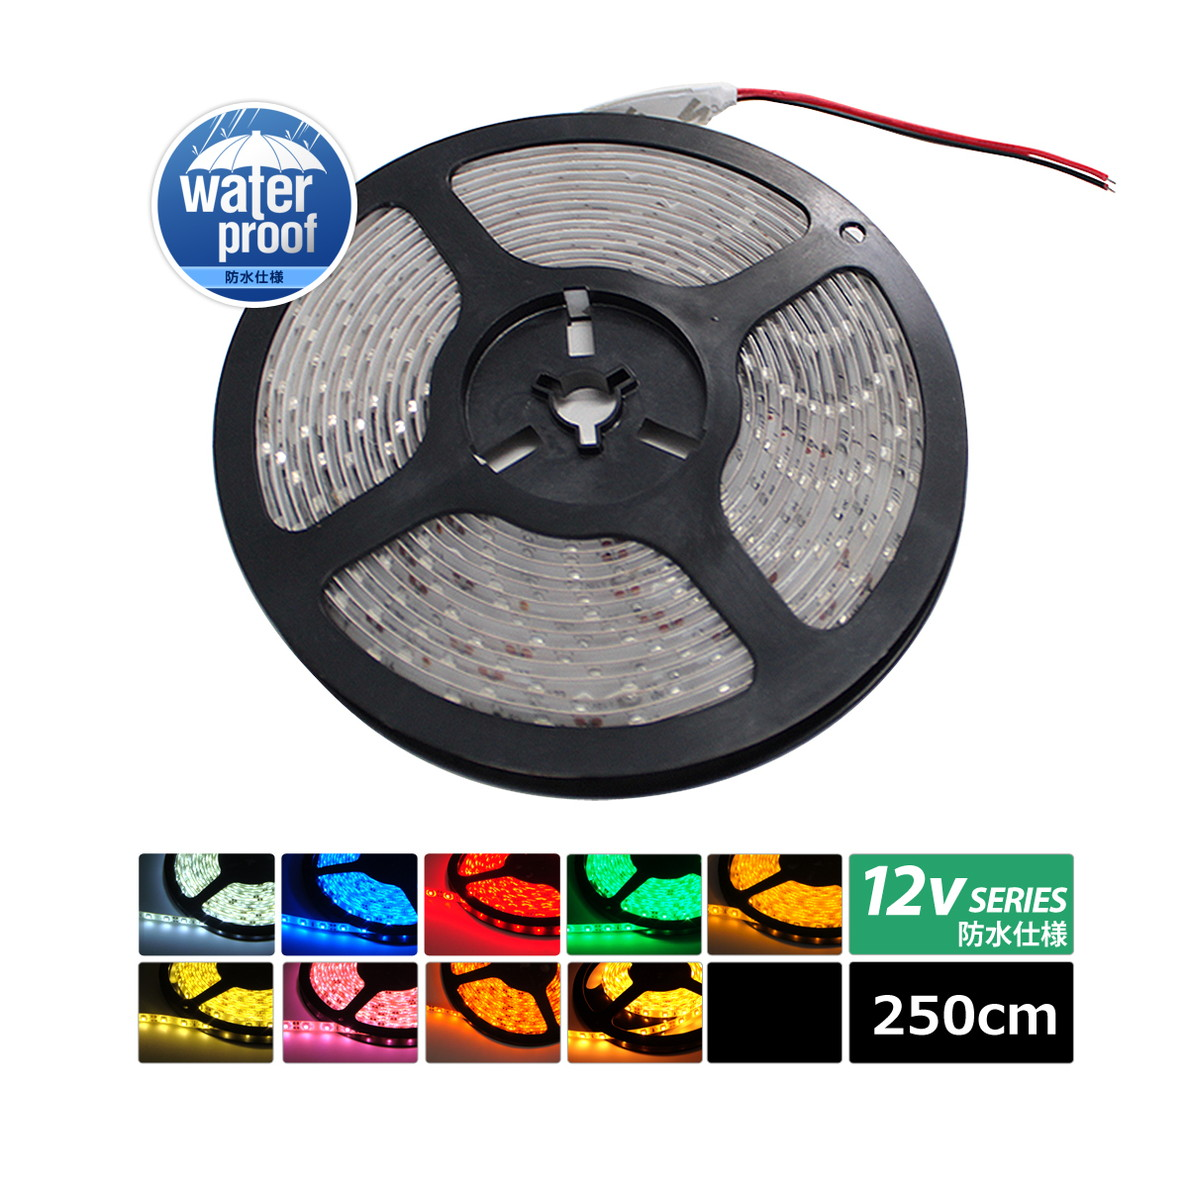 [250cm×1本] 超安12V 防水 LEDテープライト 1チップ 250cm [白ベース   ケーブル12cm]